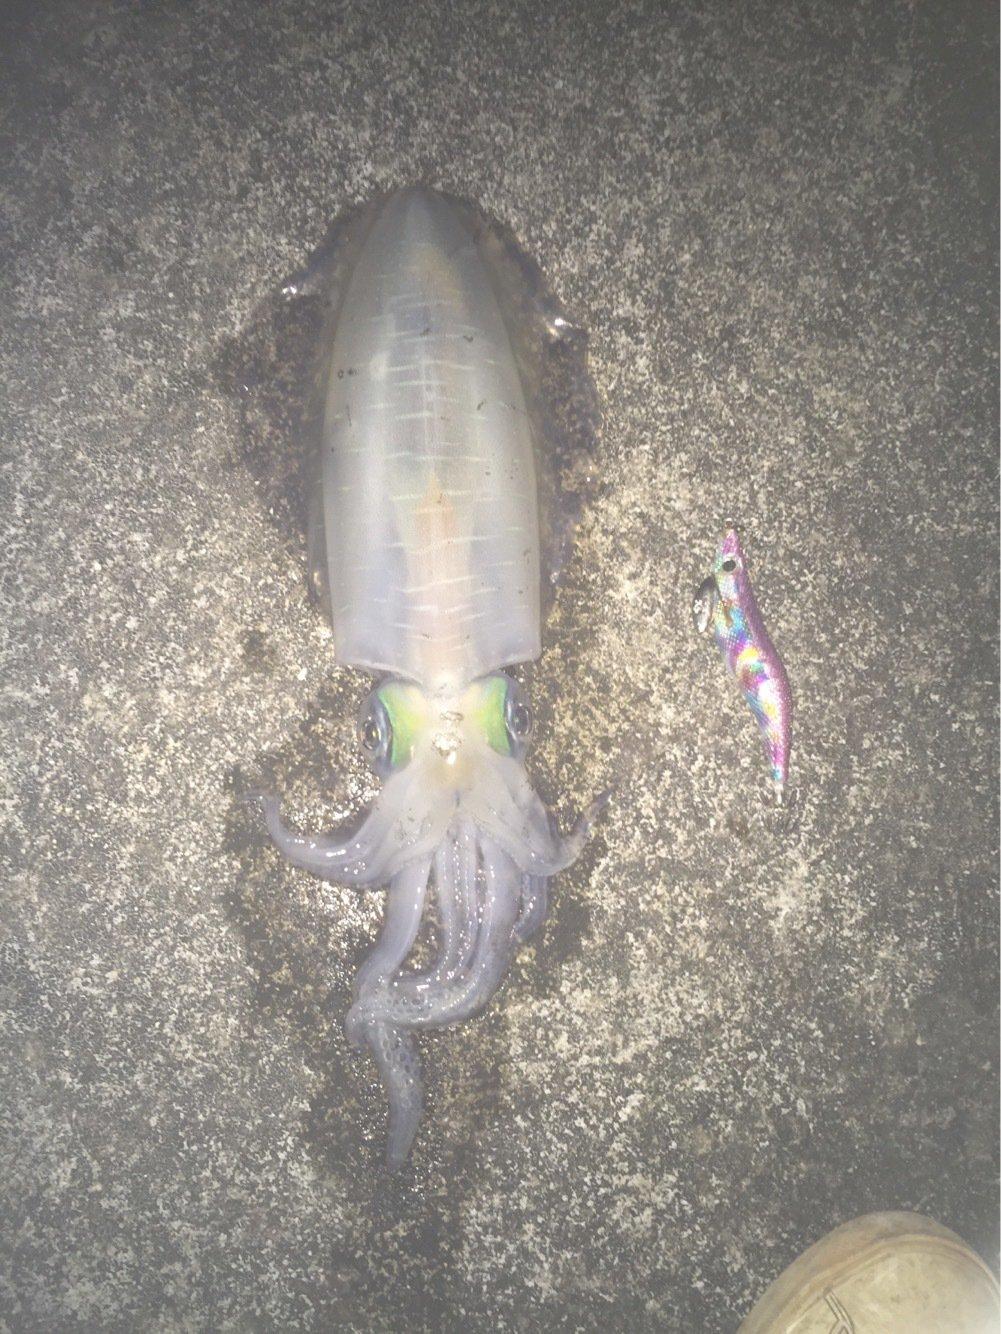 skaさんの投稿画像,写っている魚はアオリイカ